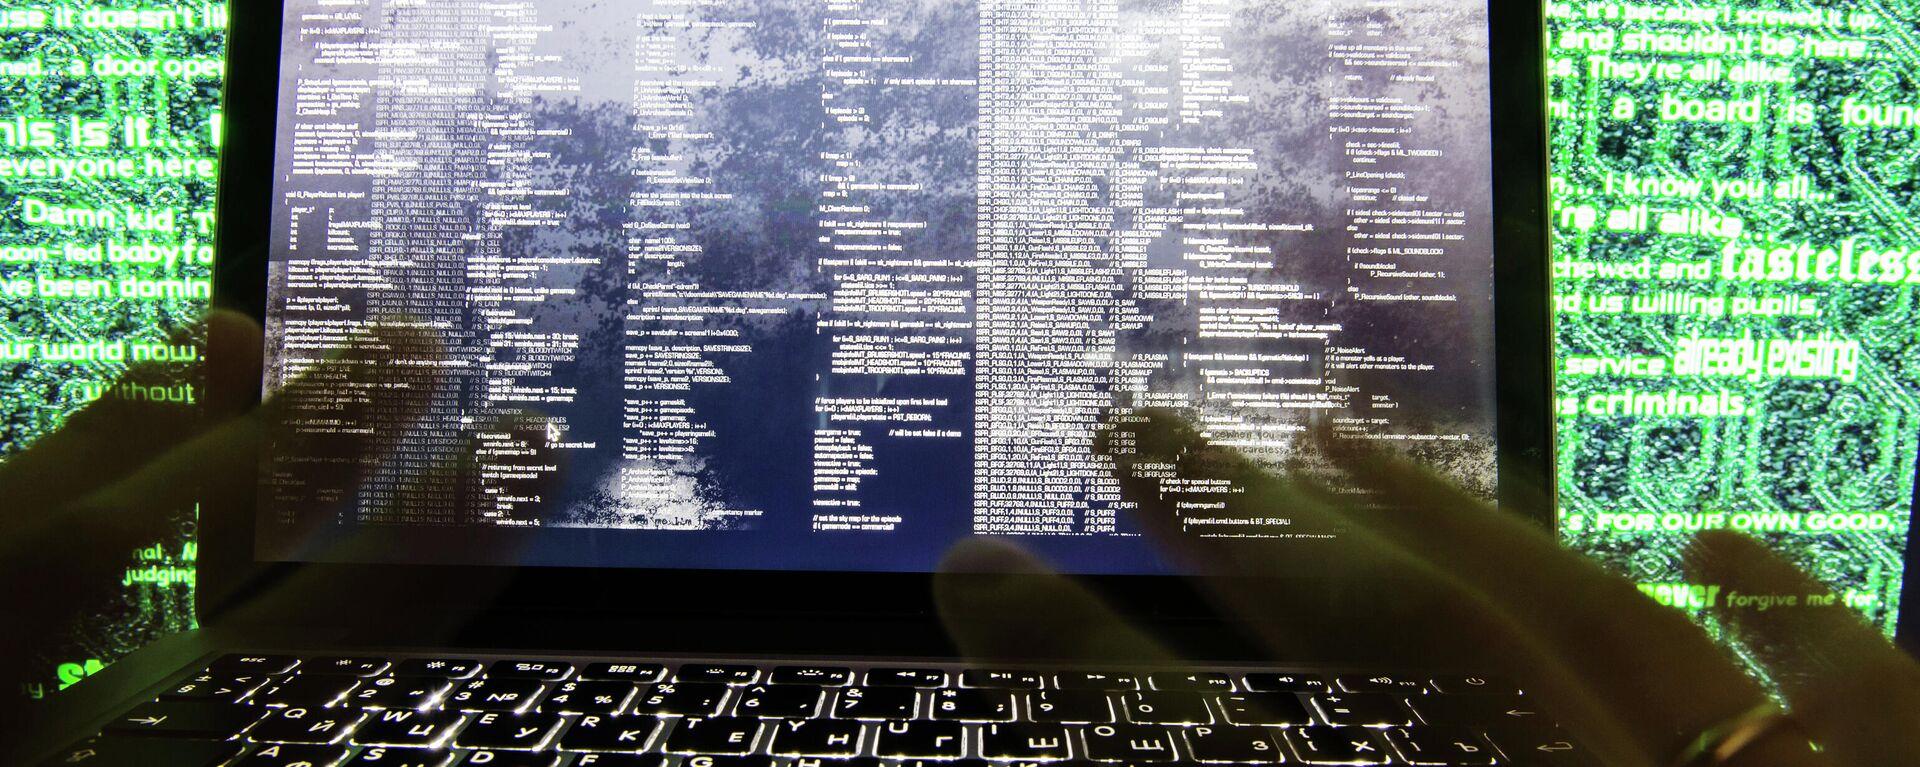 Hackerangriff (Symbolbild) - SNA, 1920, 30.06.2021